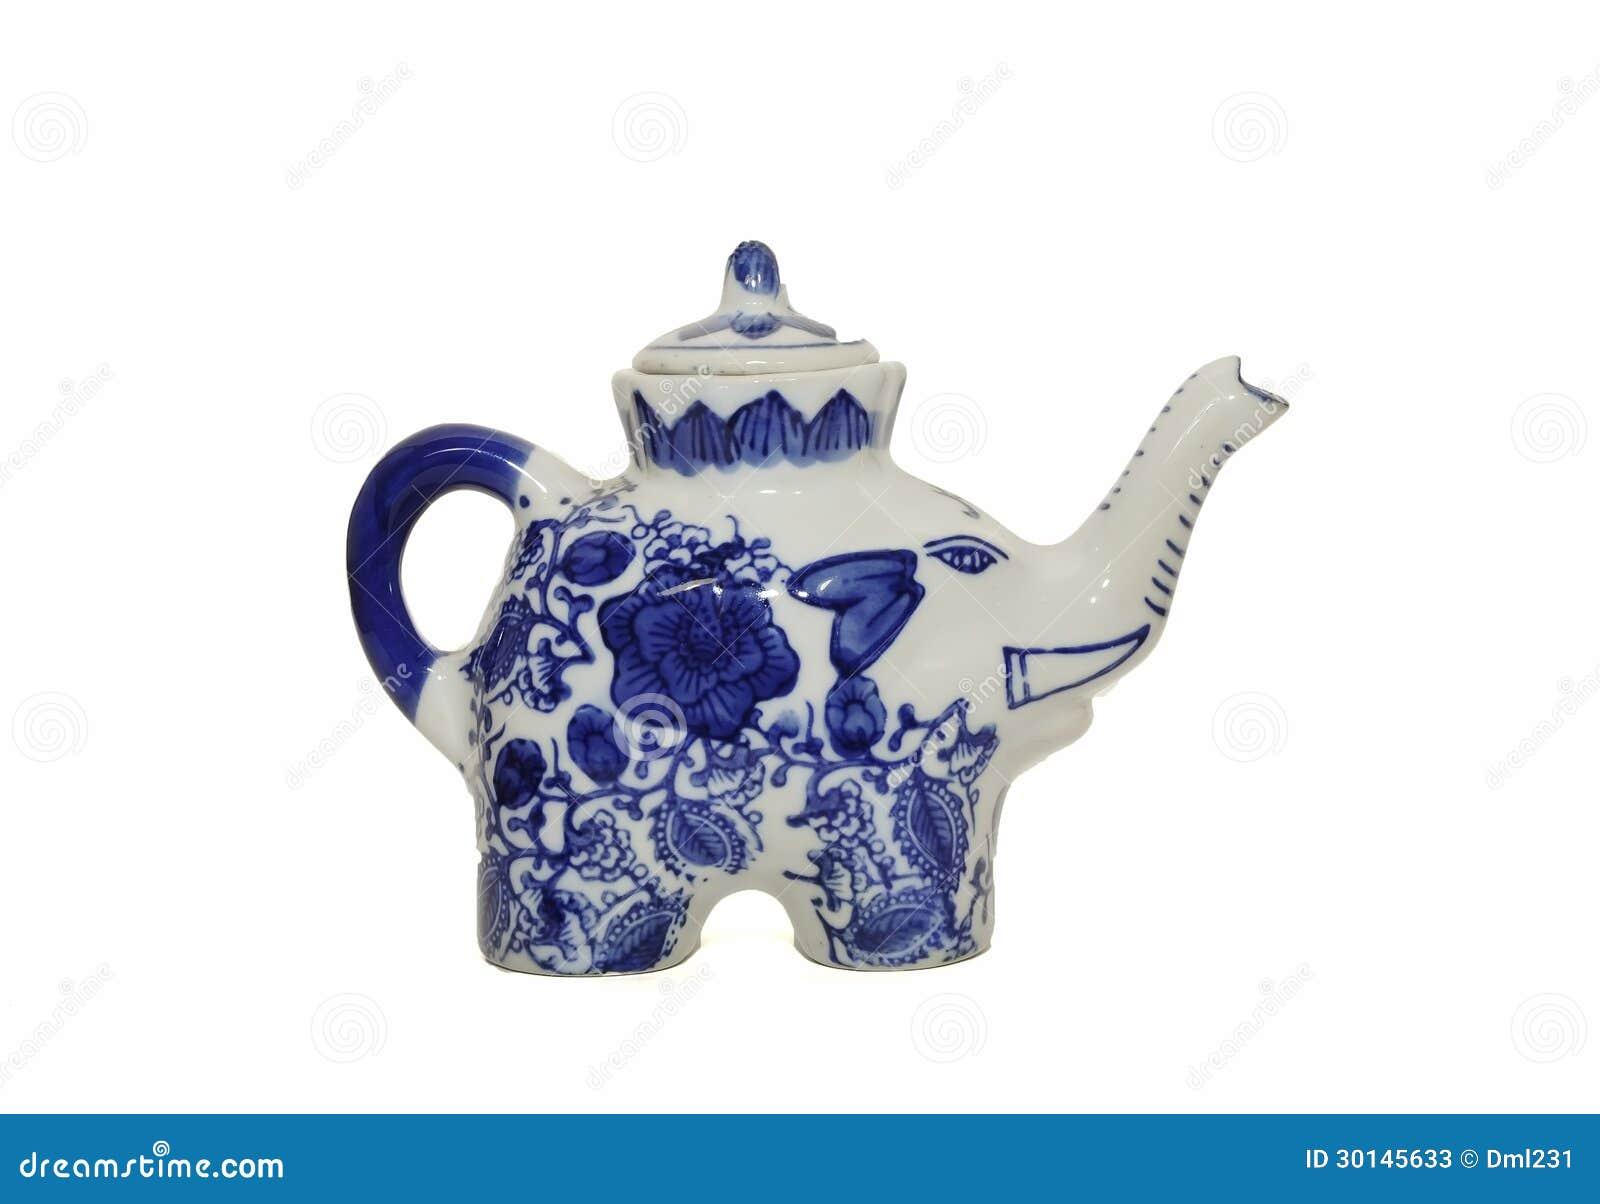 Ceramic elephant teapot stock photos image 30145633 - Elephant shaped teapot ...